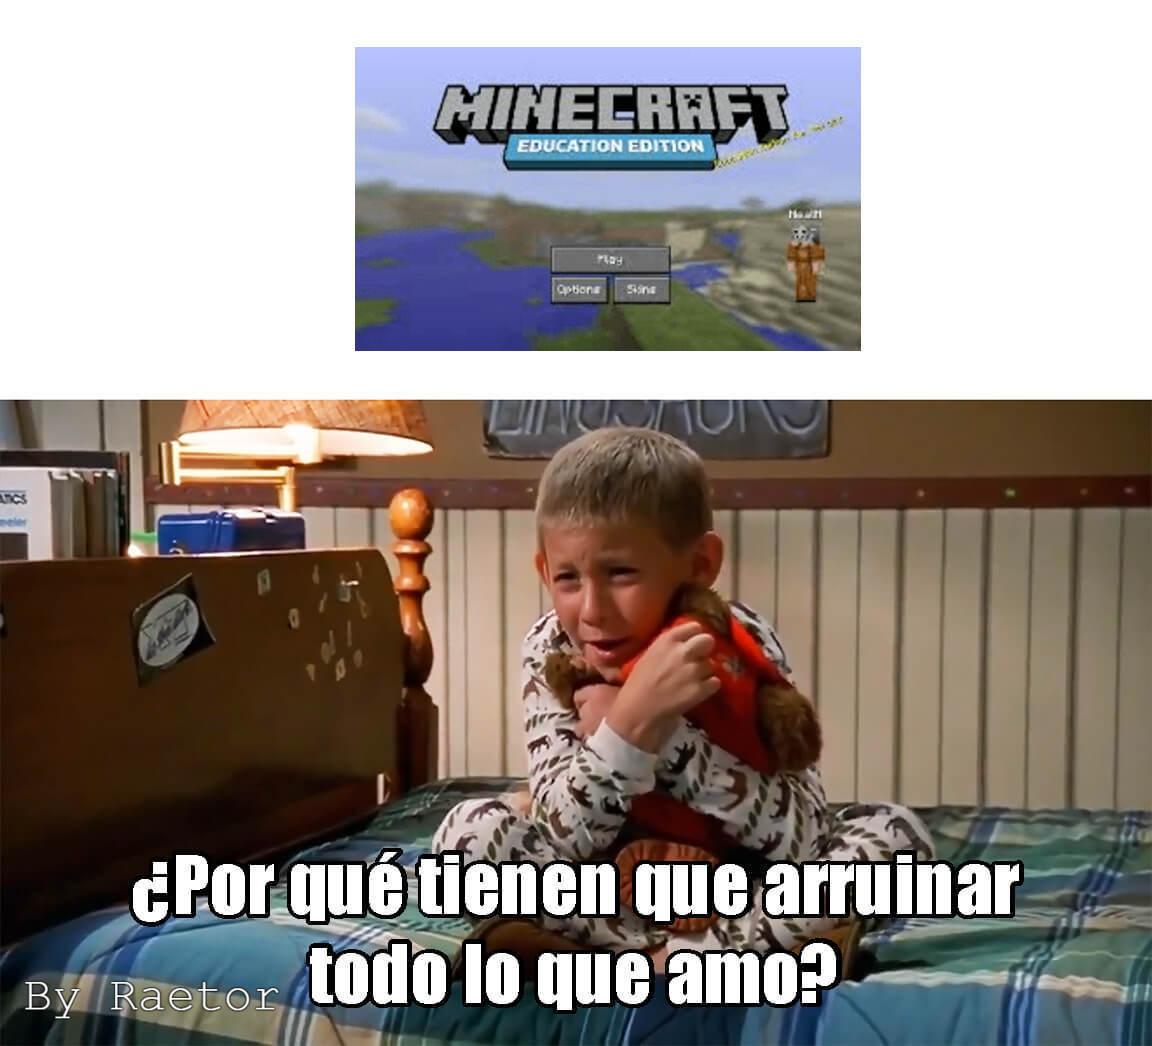 ¿Minecraft? - meme